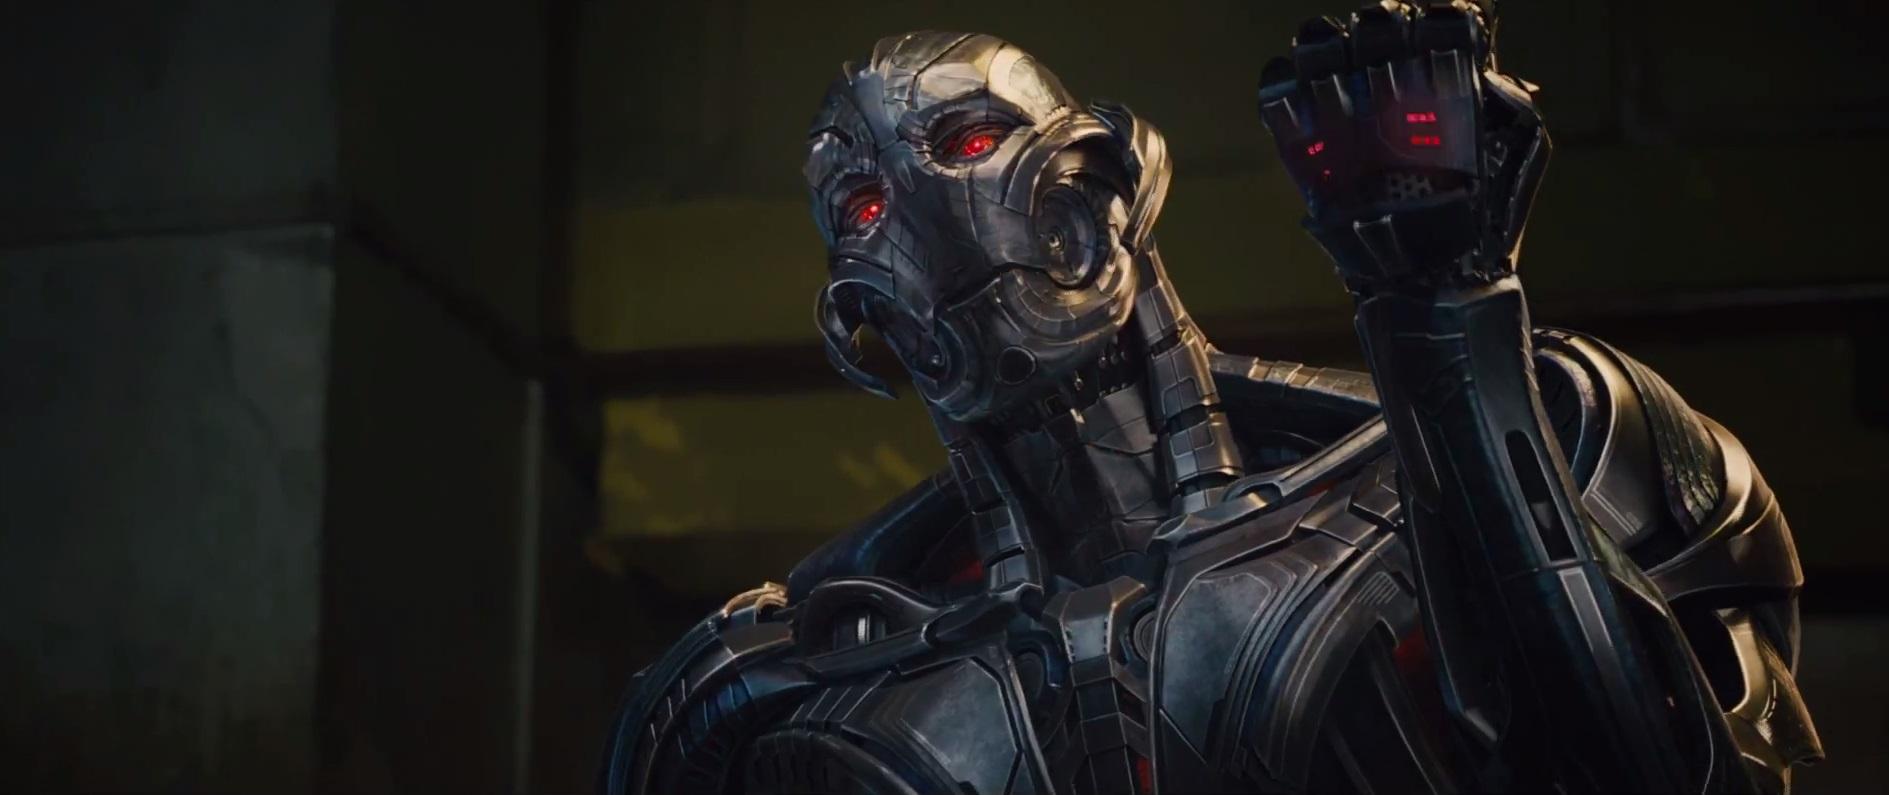 Los vengadores, la era de Ultron - mivideoteca